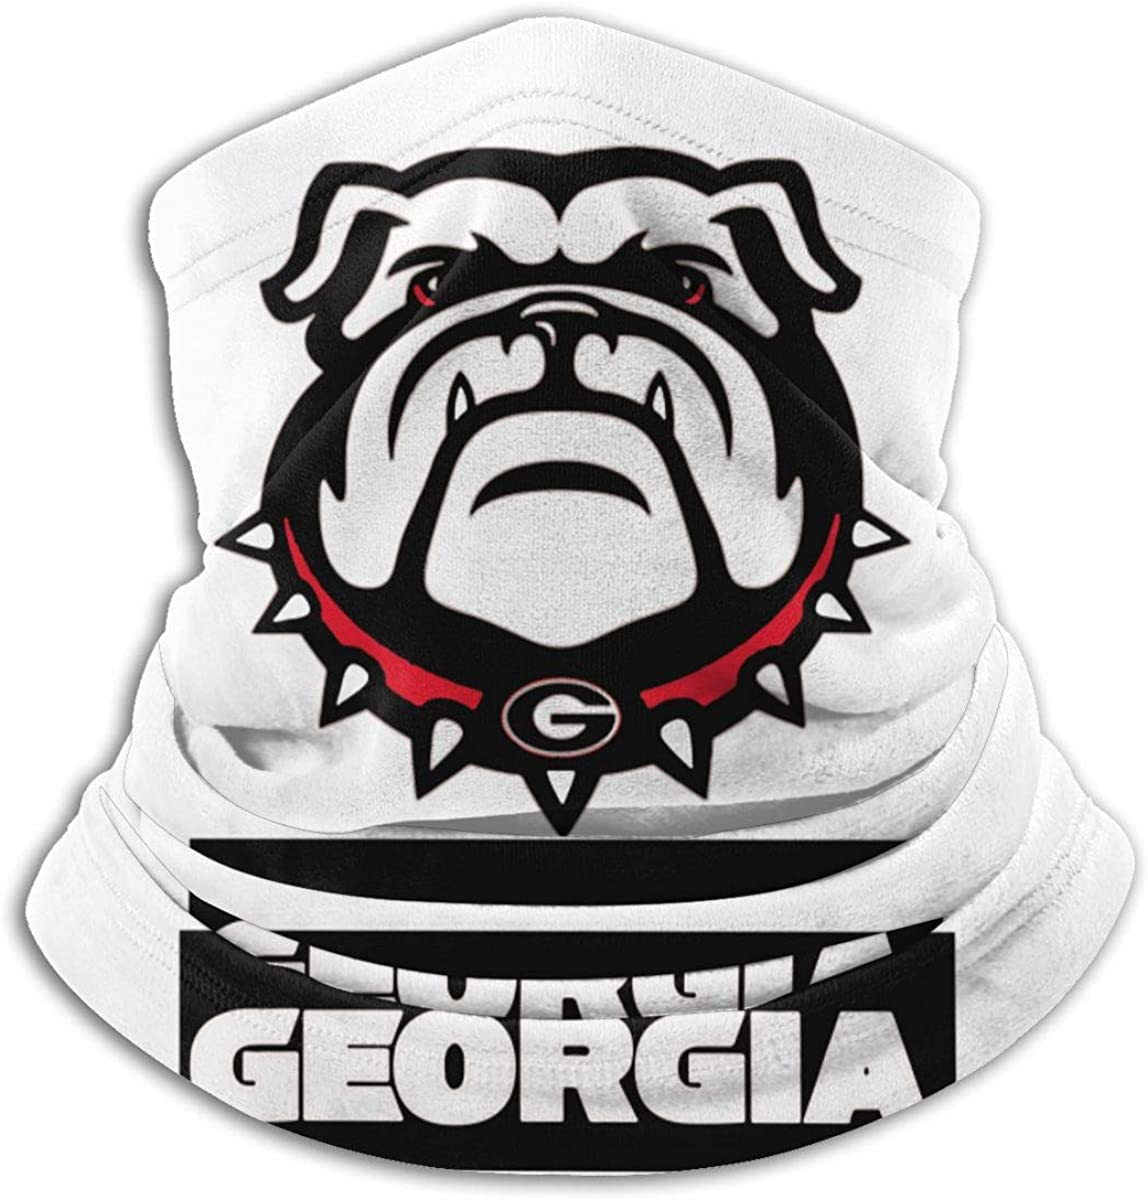 Georgia Bulldogs Black Multi-function Neck Warmer Gaiter Polyester Neck Warmer Windproof Winter Neck Gaiter Cold Weather Scarf For Men Women